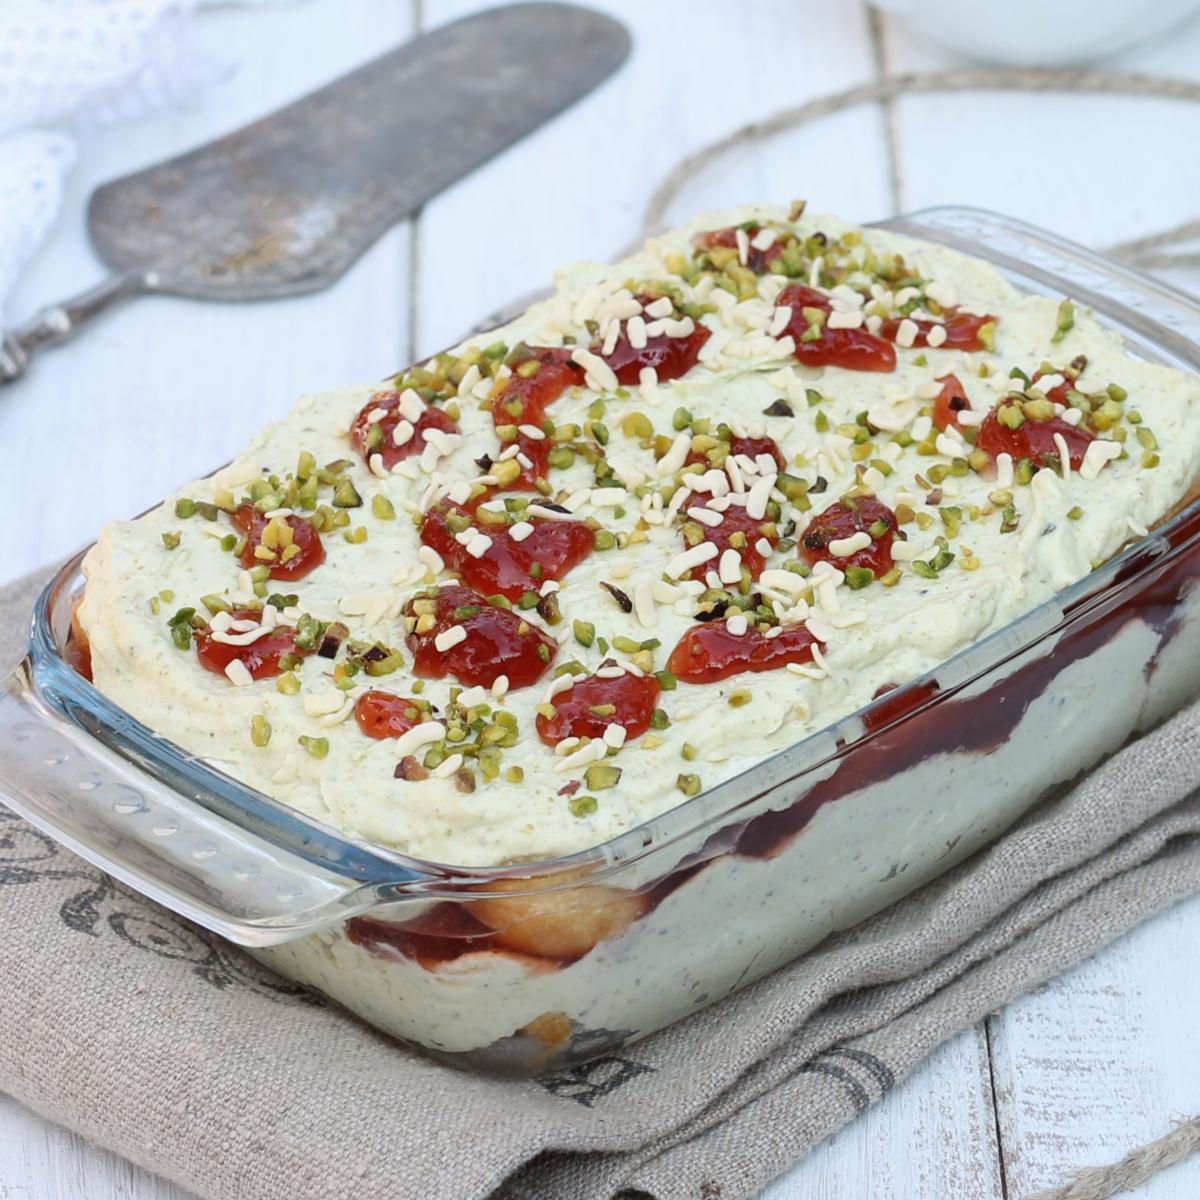 SEMIFREDDO FRAGOLE PISTACCHI ricetta dolce fragole e mascarpone